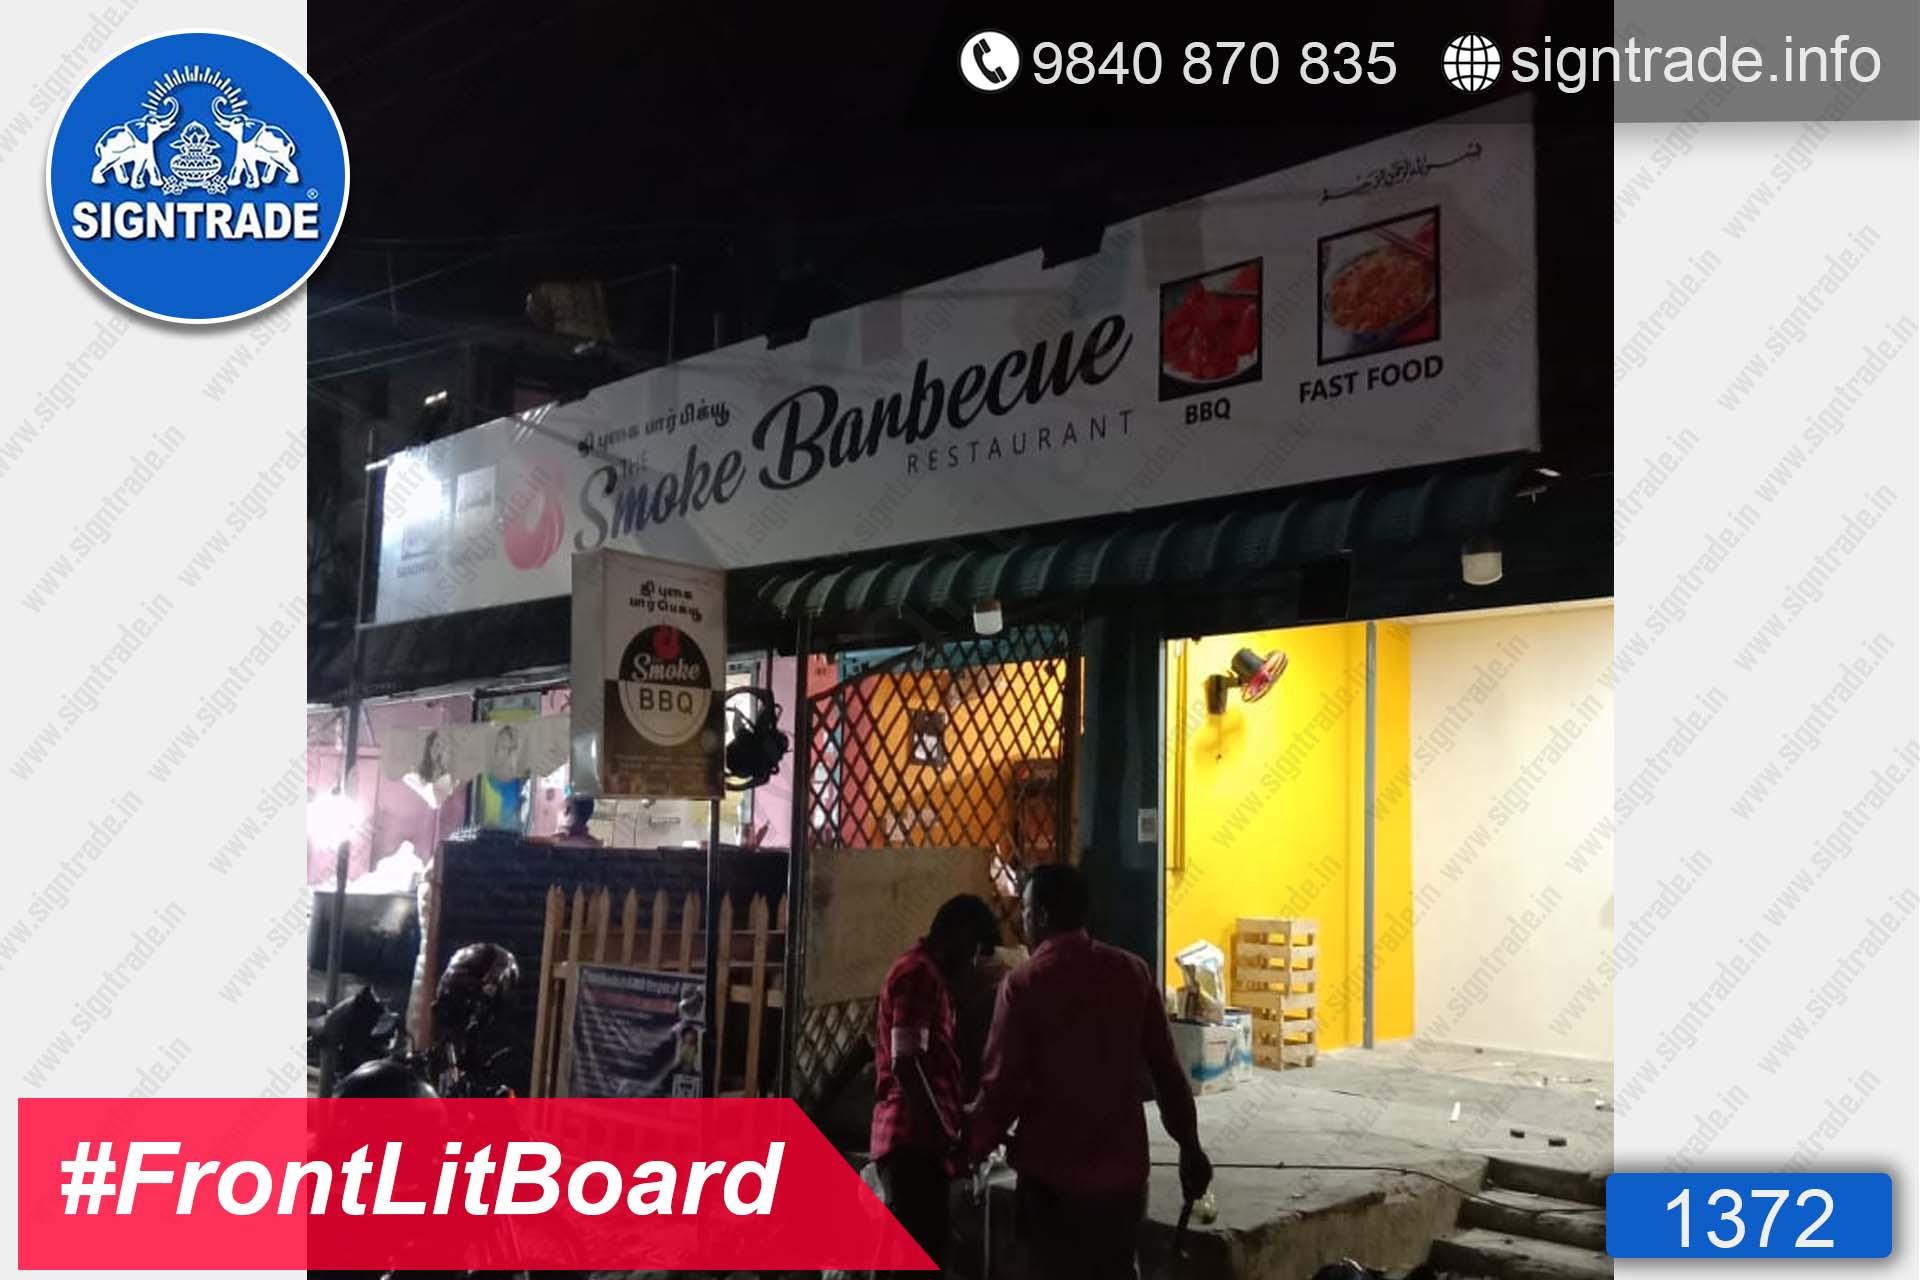 The Smoke Barbeque - Chennai - SIGNTRADE - Frontlit Flex Board - Digital Printing Services in Chennai